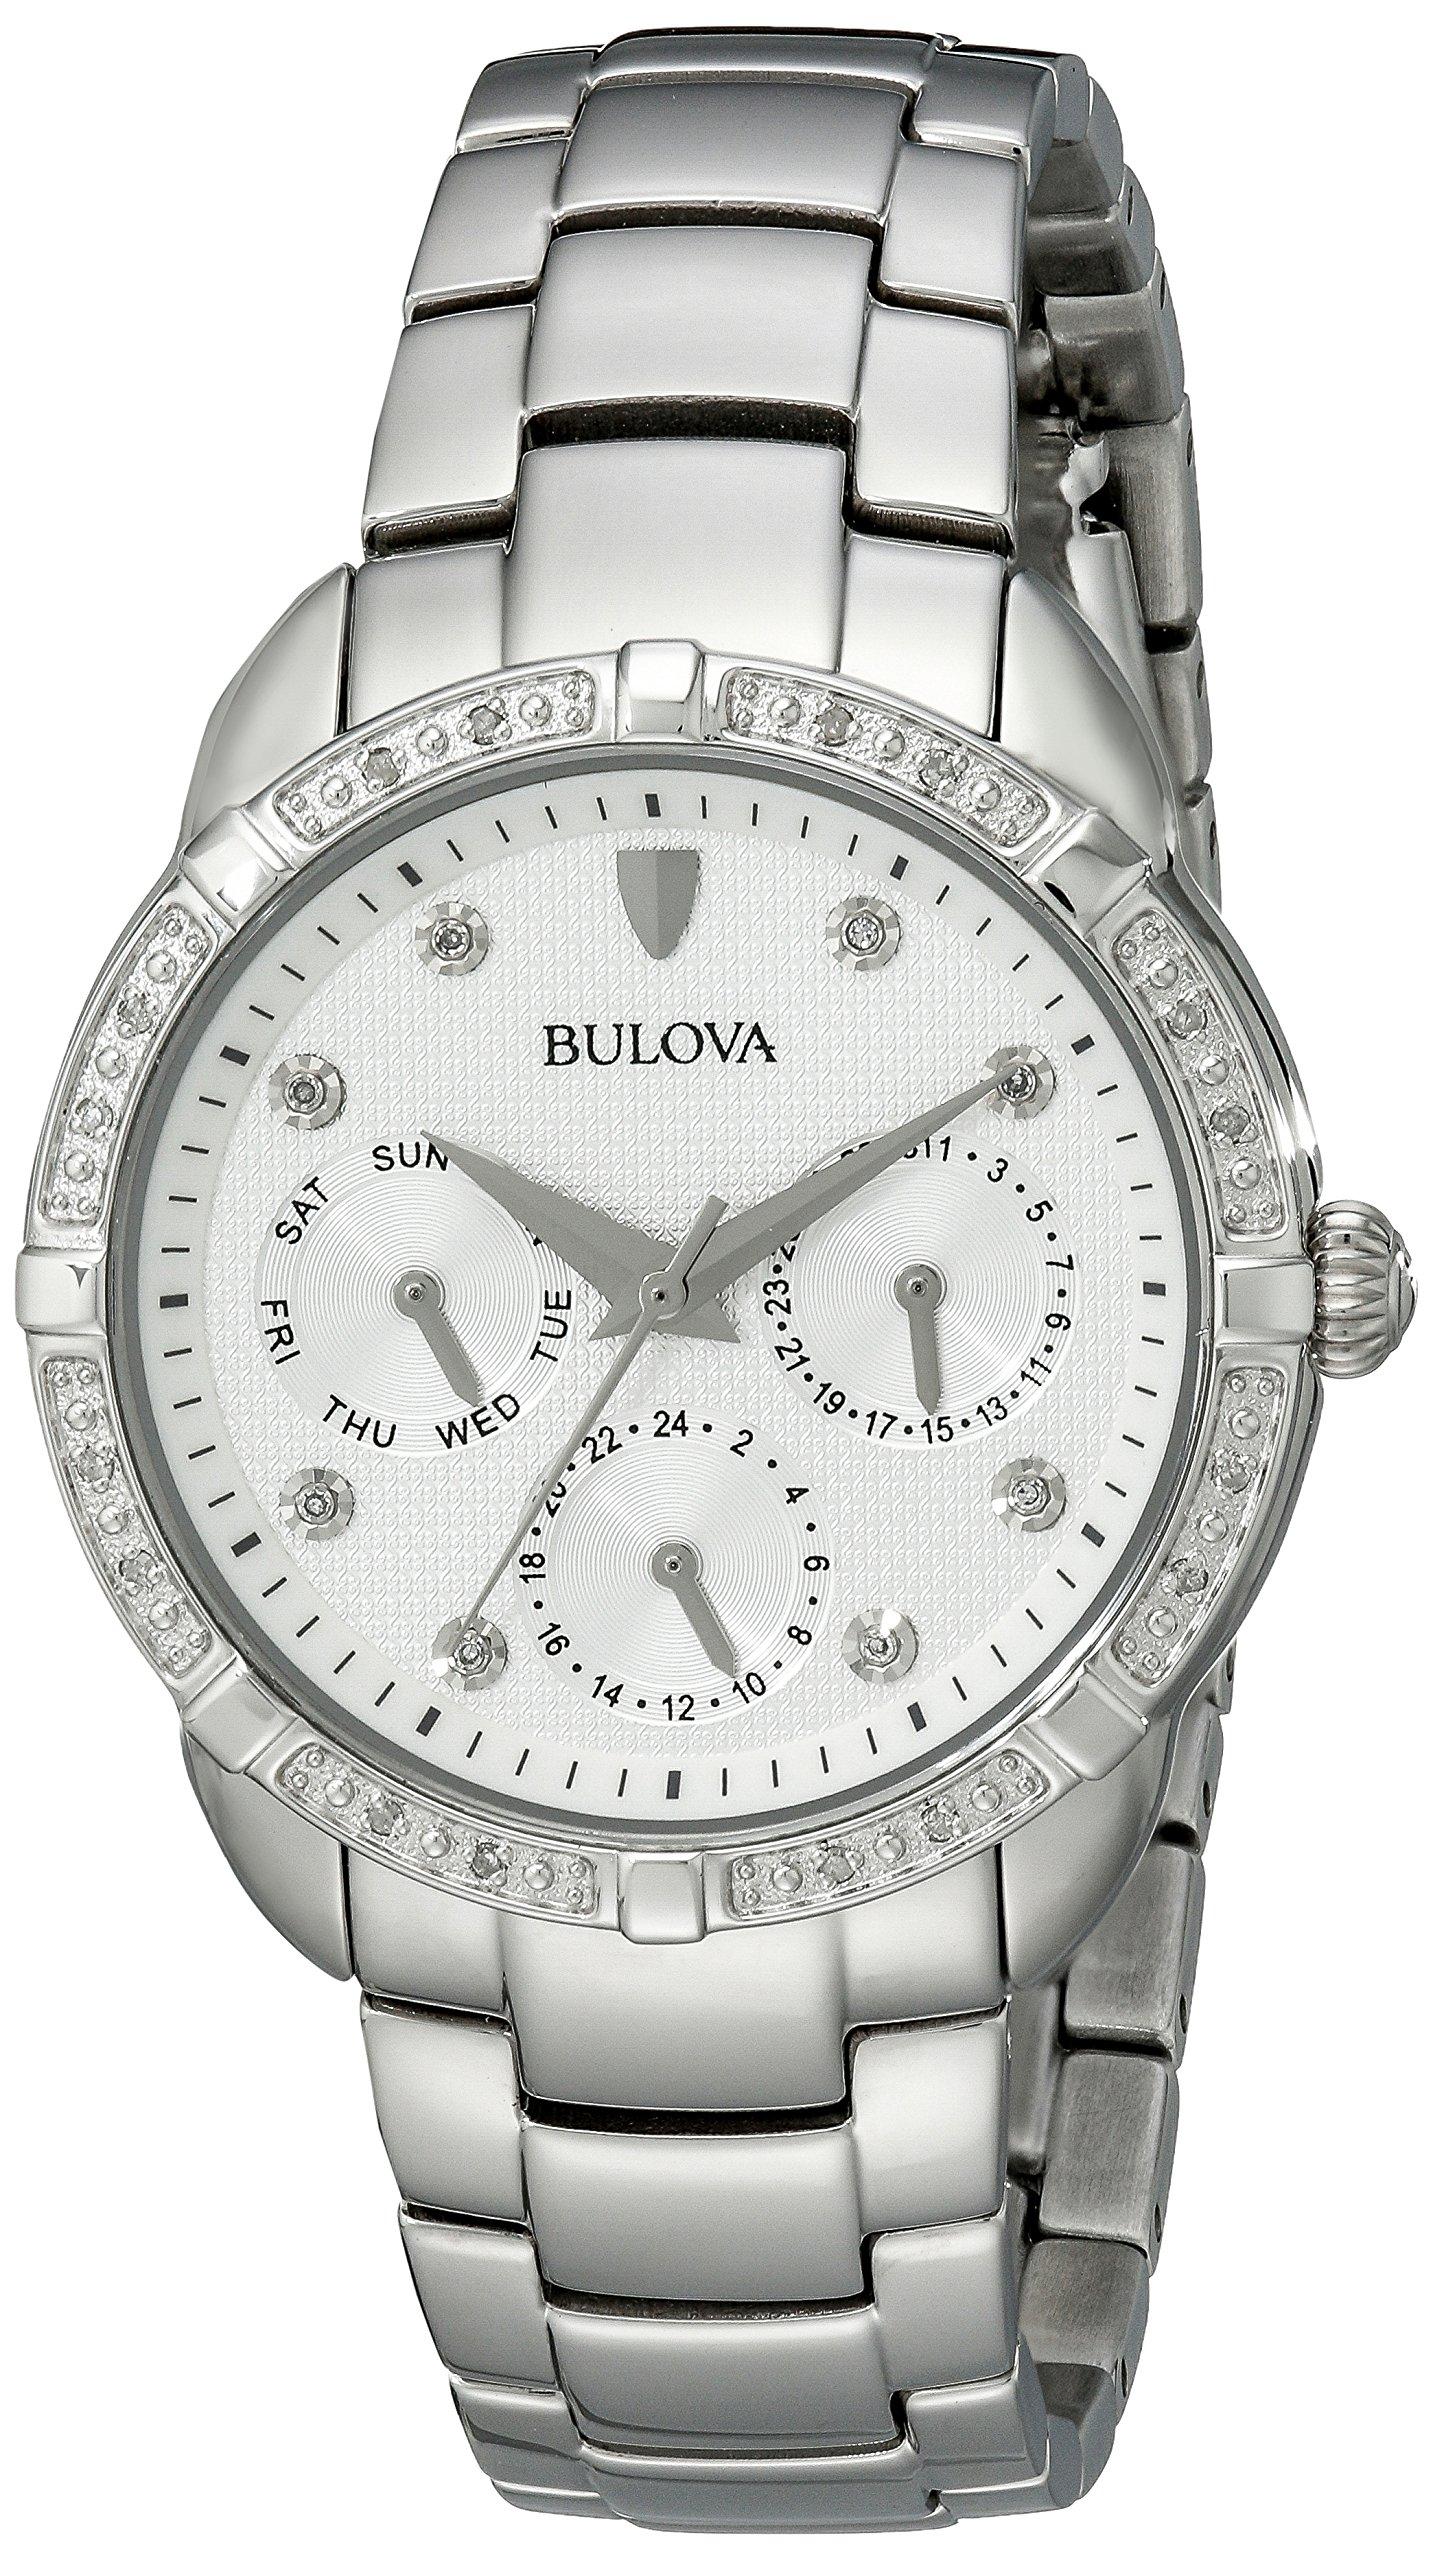 Bulova Women's 96R195 Multi-Function Dial Stainless Steel  Watch by Bulova (Image #1)